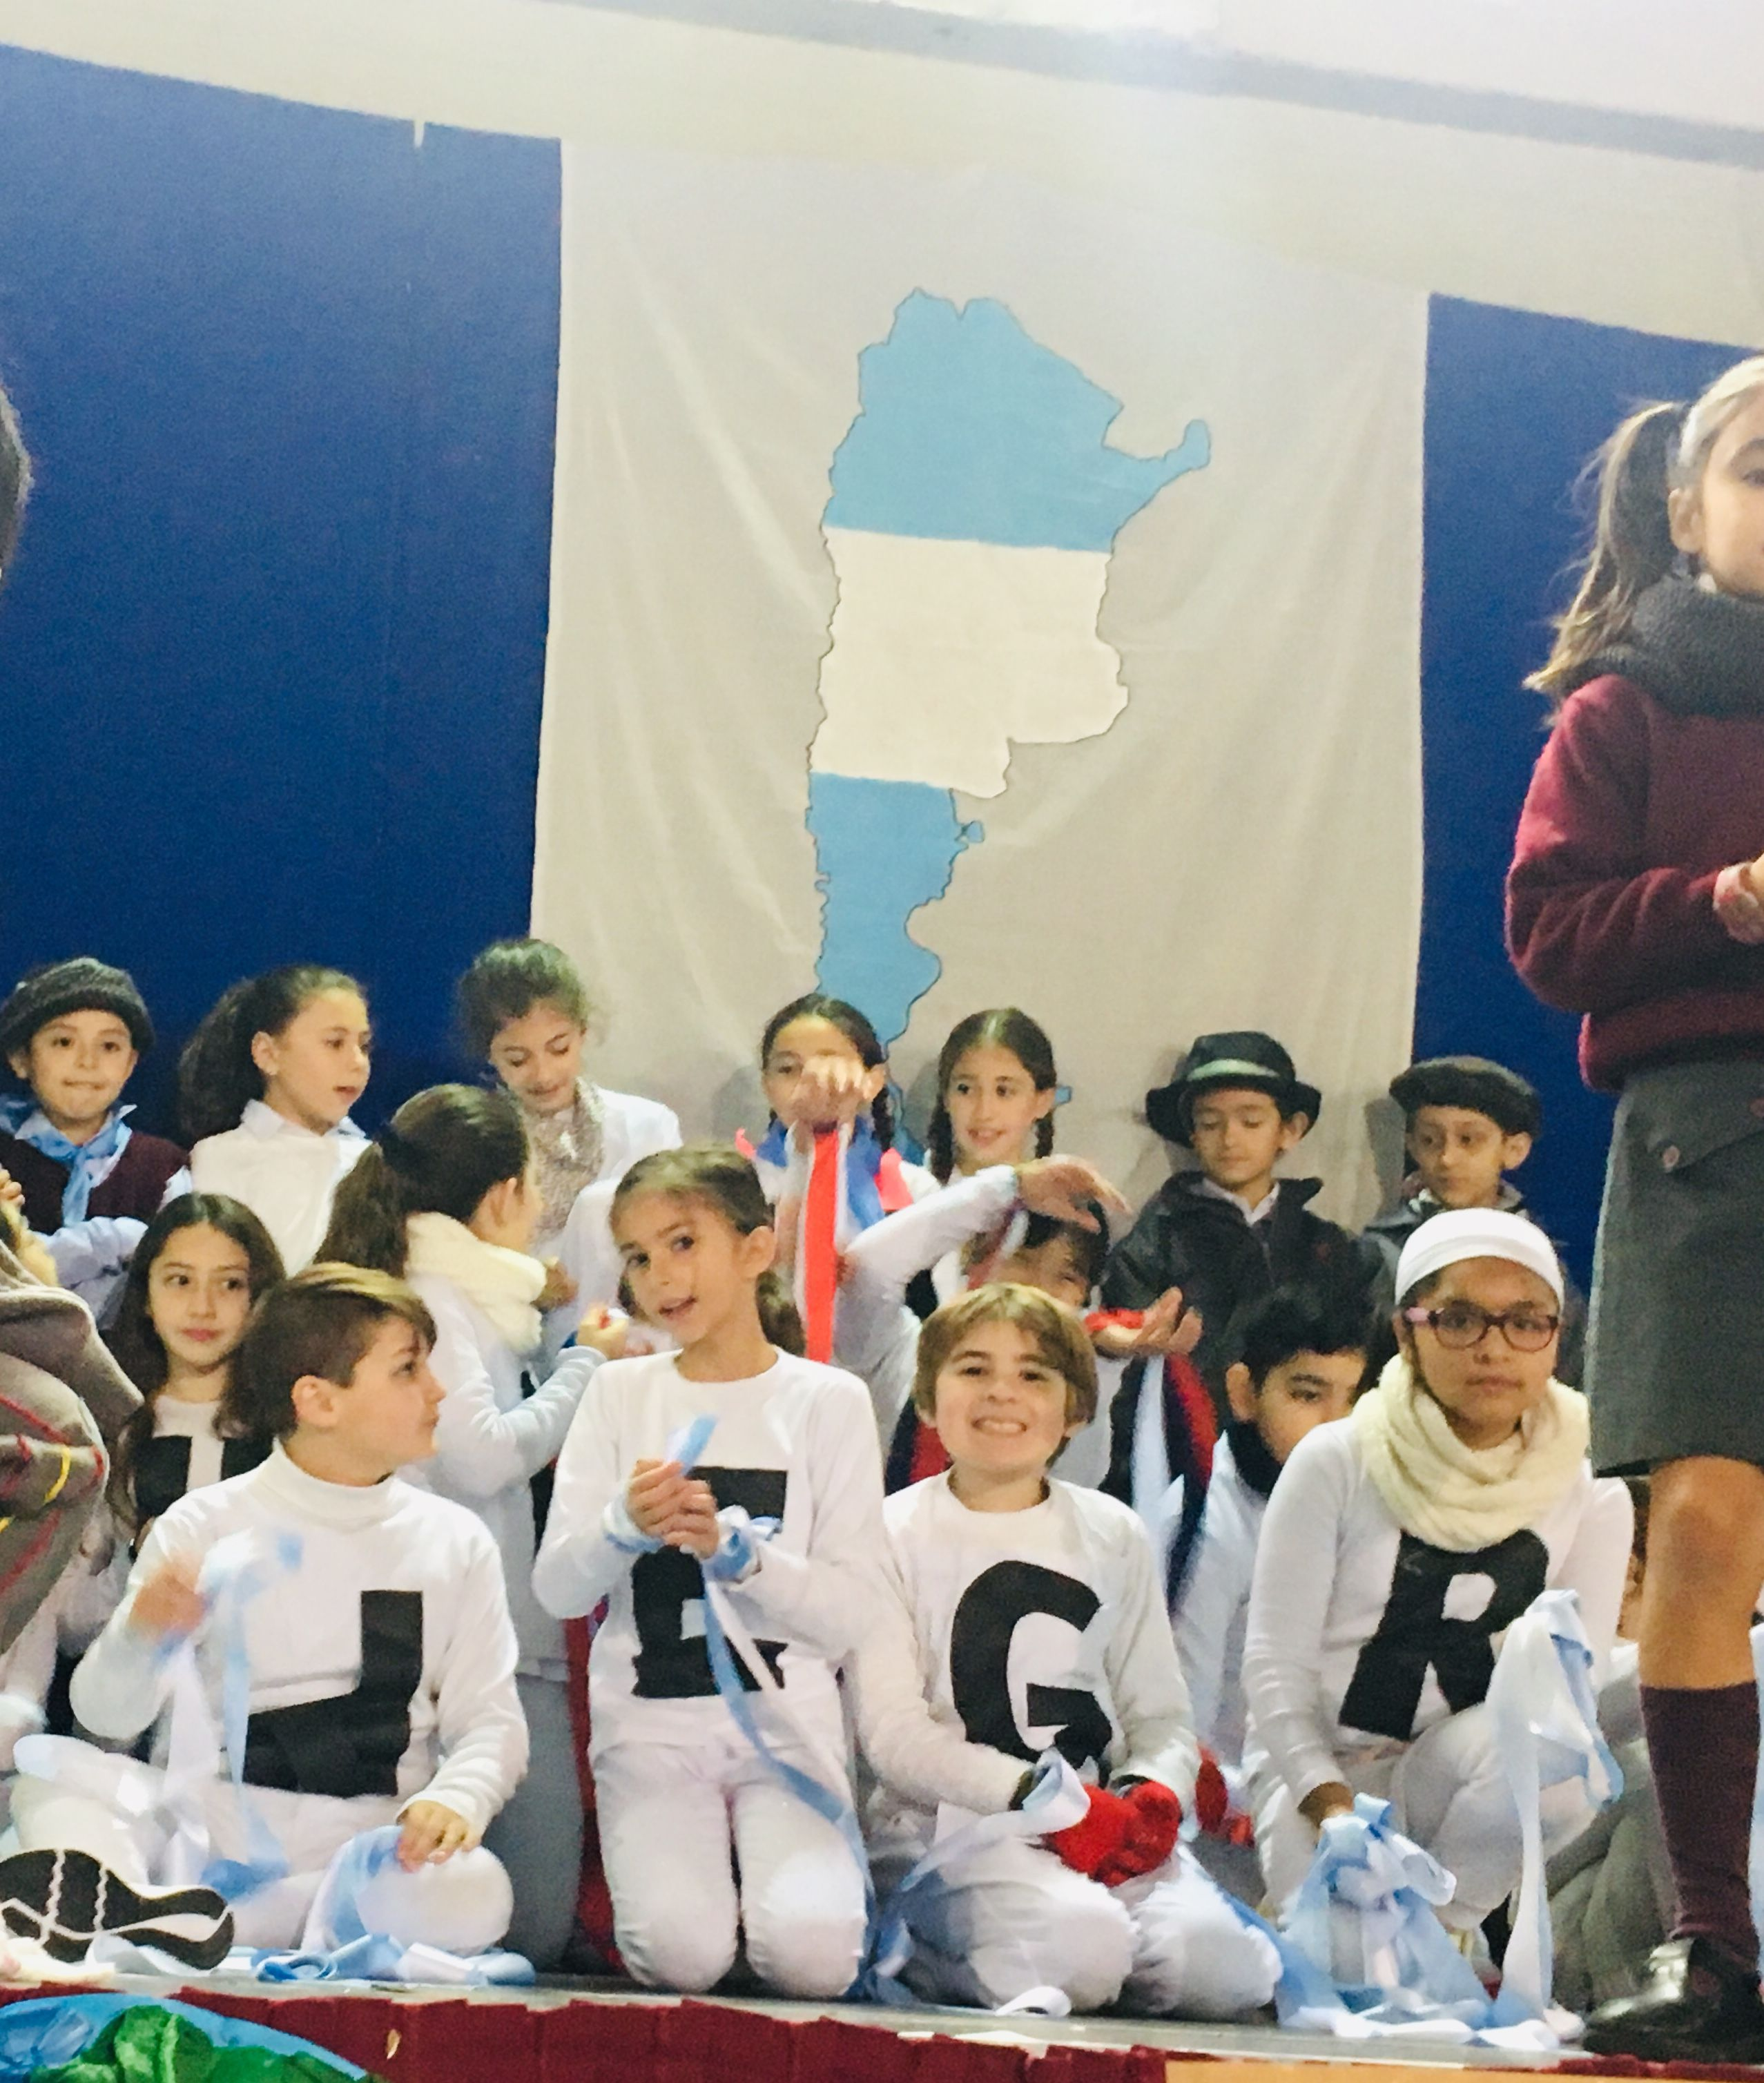 Pin de Paula Montes en Efemérides 2019.